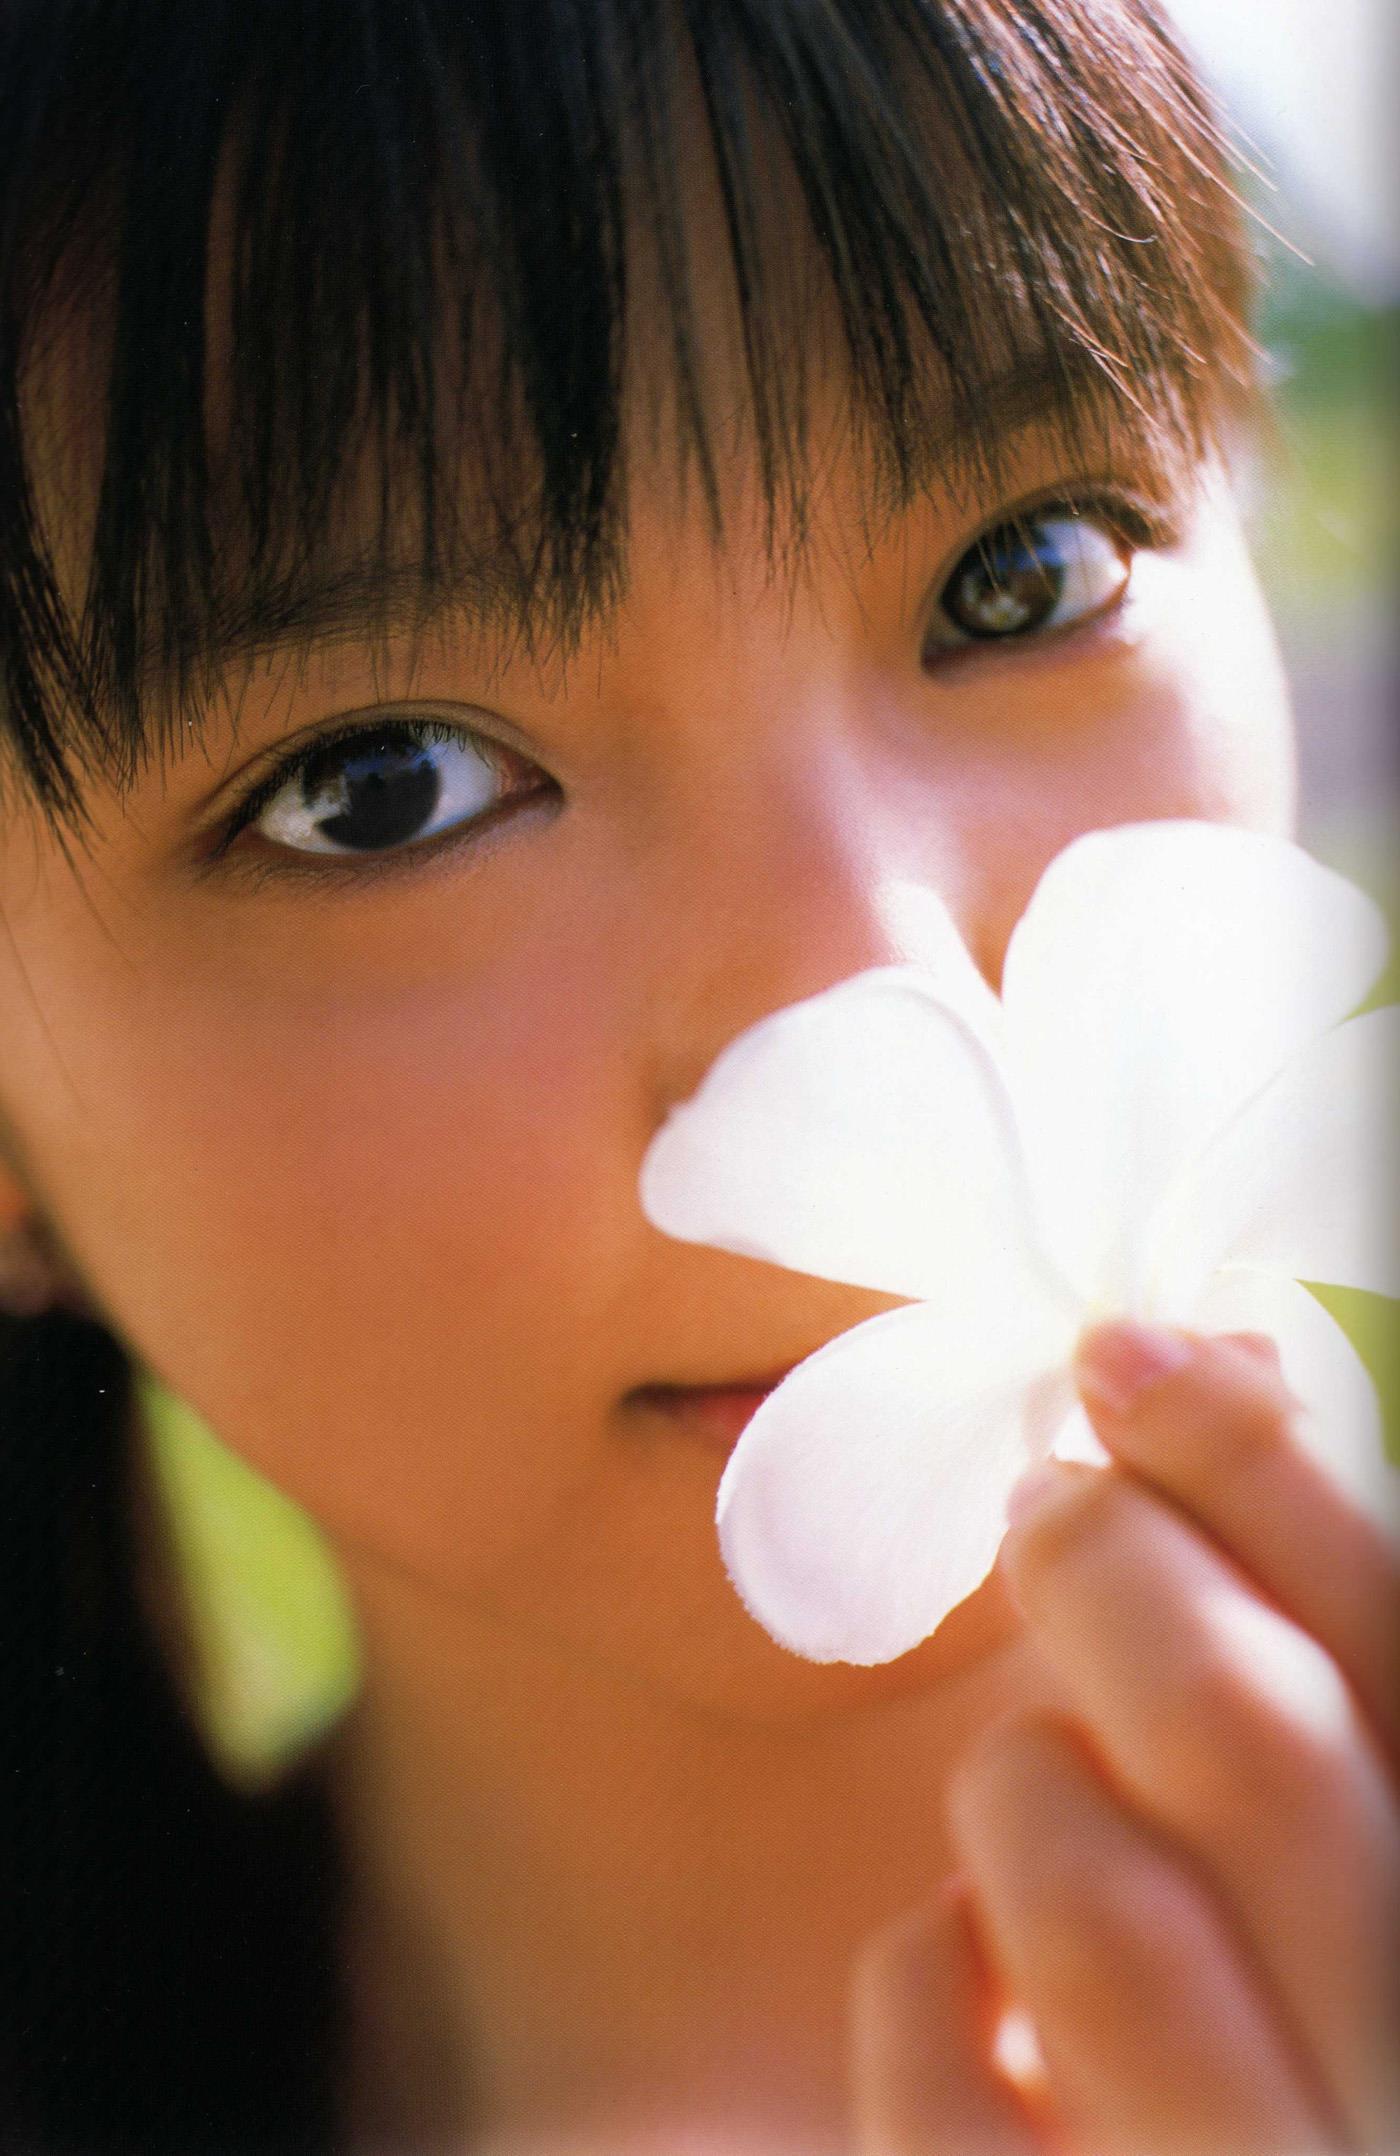 真野恵里菜 エロ画像 99